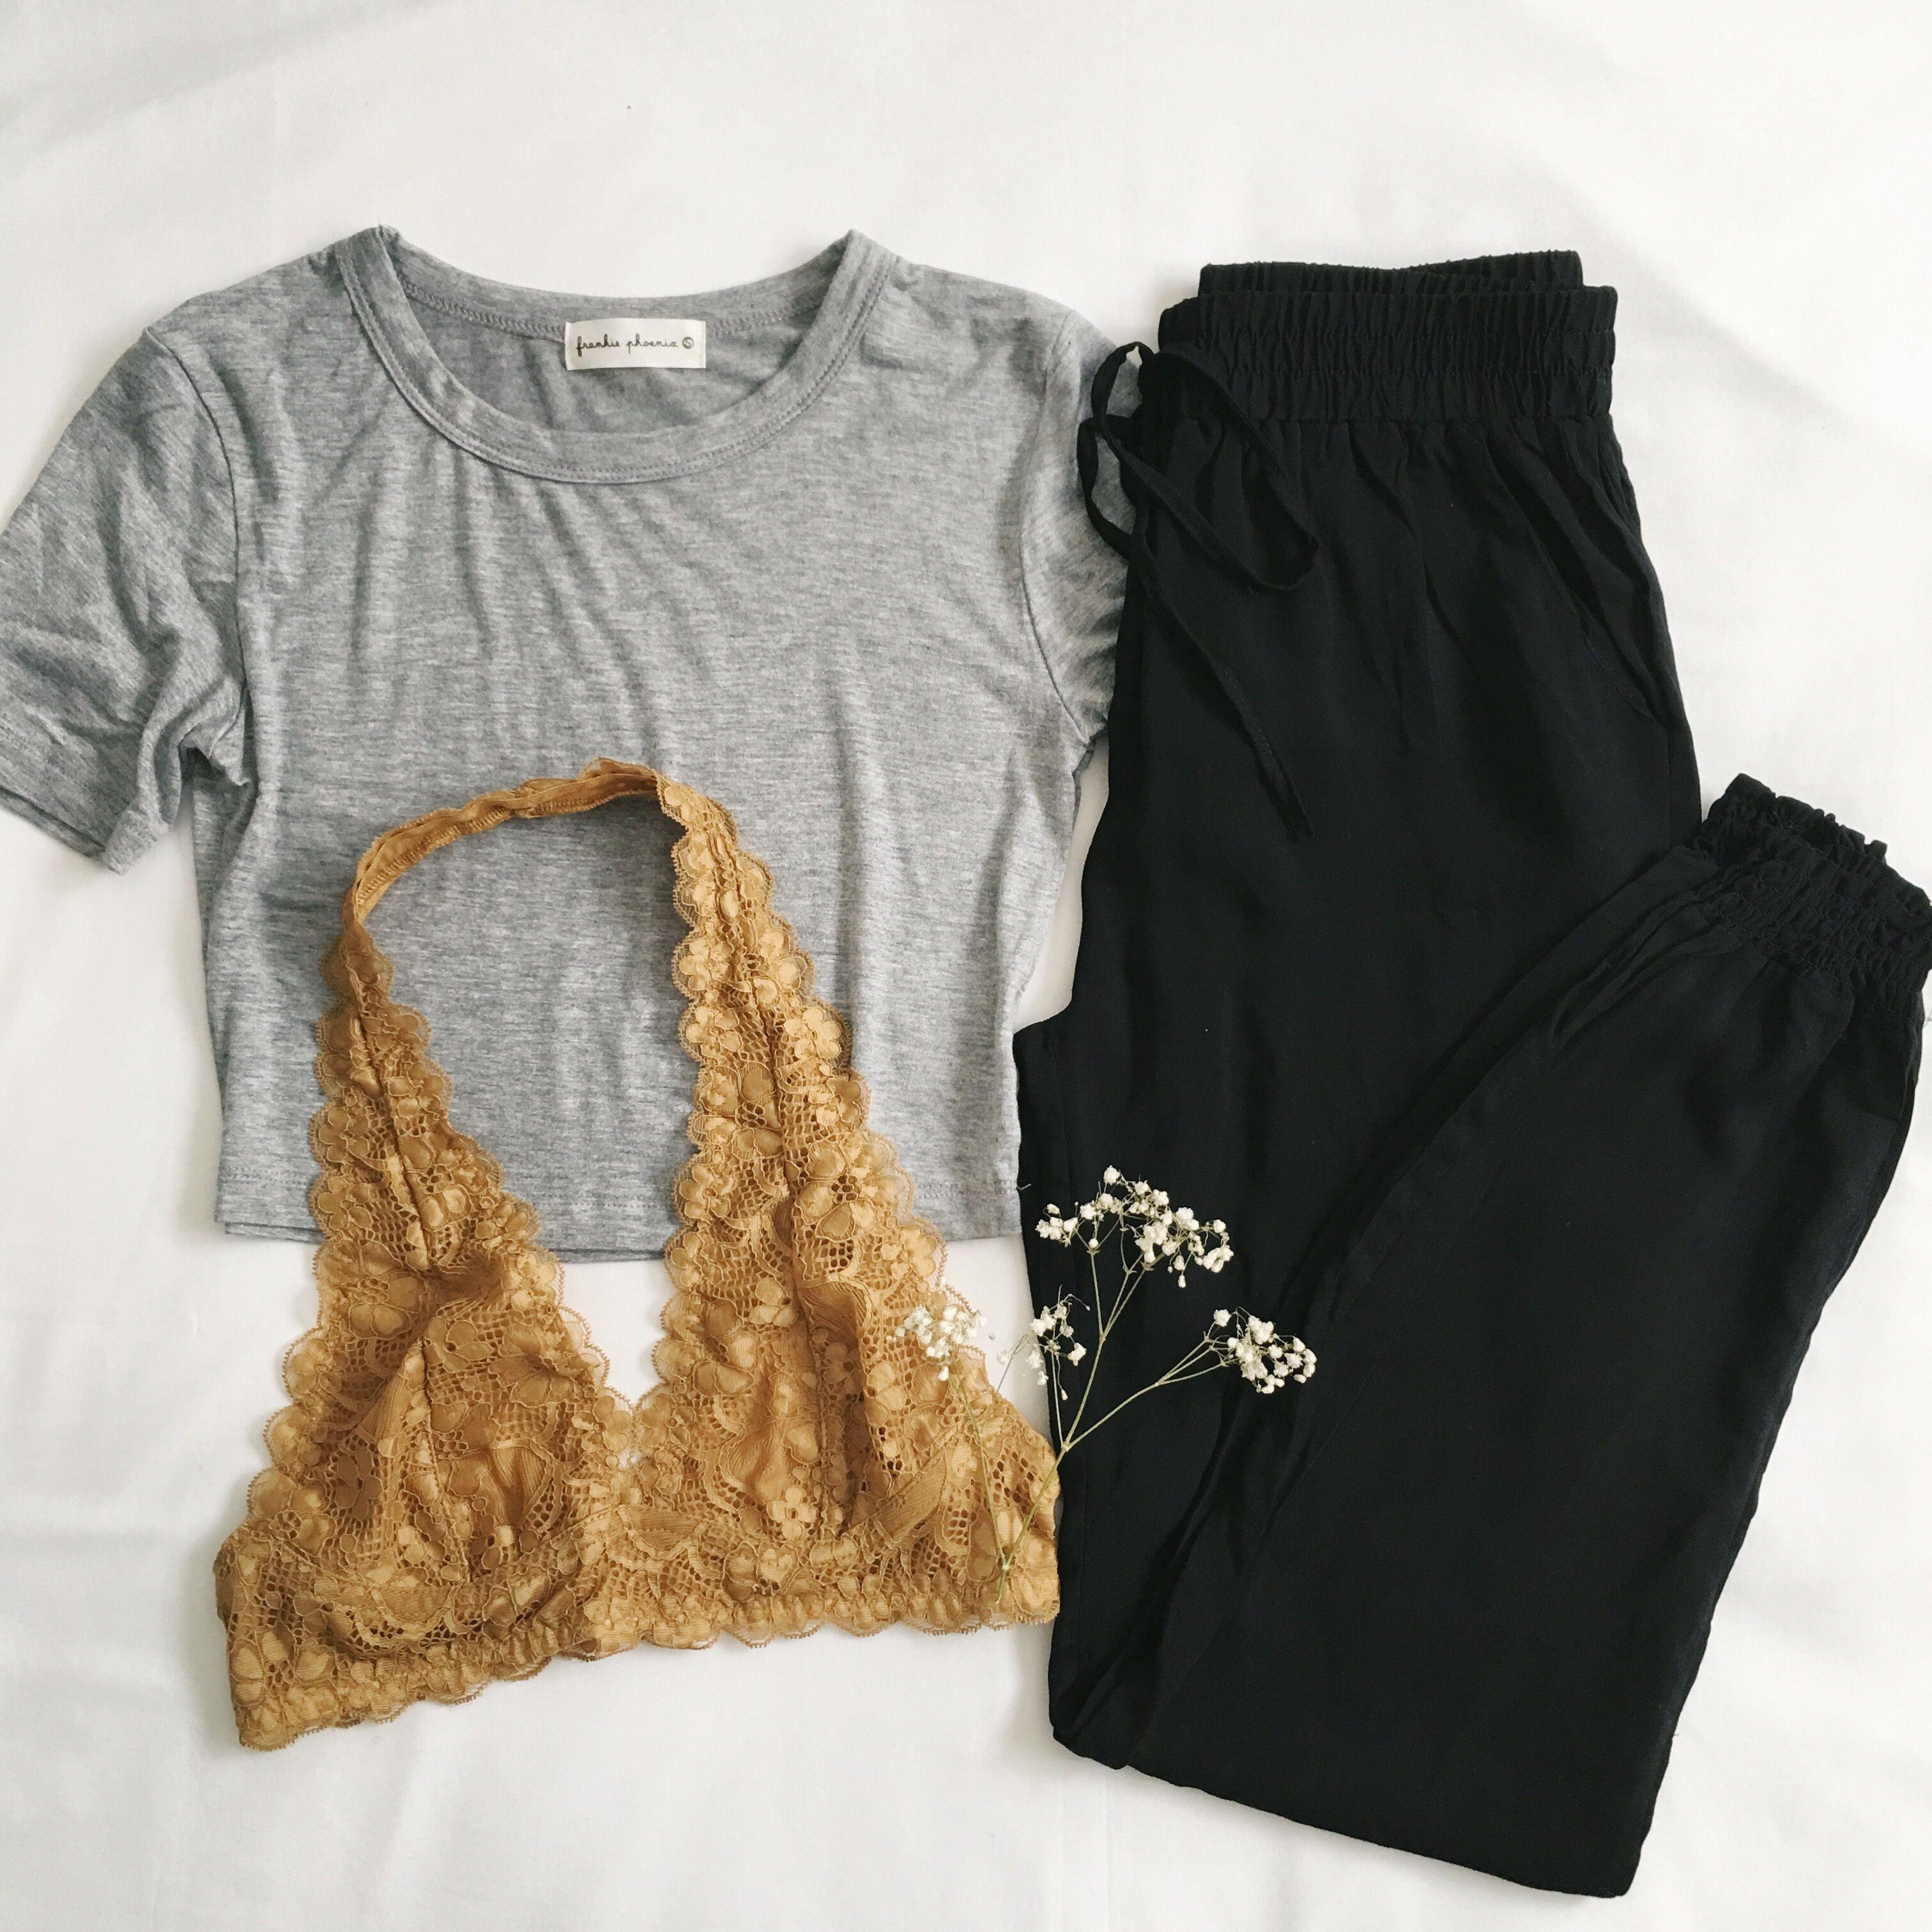 Get comfy with: Jane Crop Tee • Clara Pocket Joggers • Kara Bralette